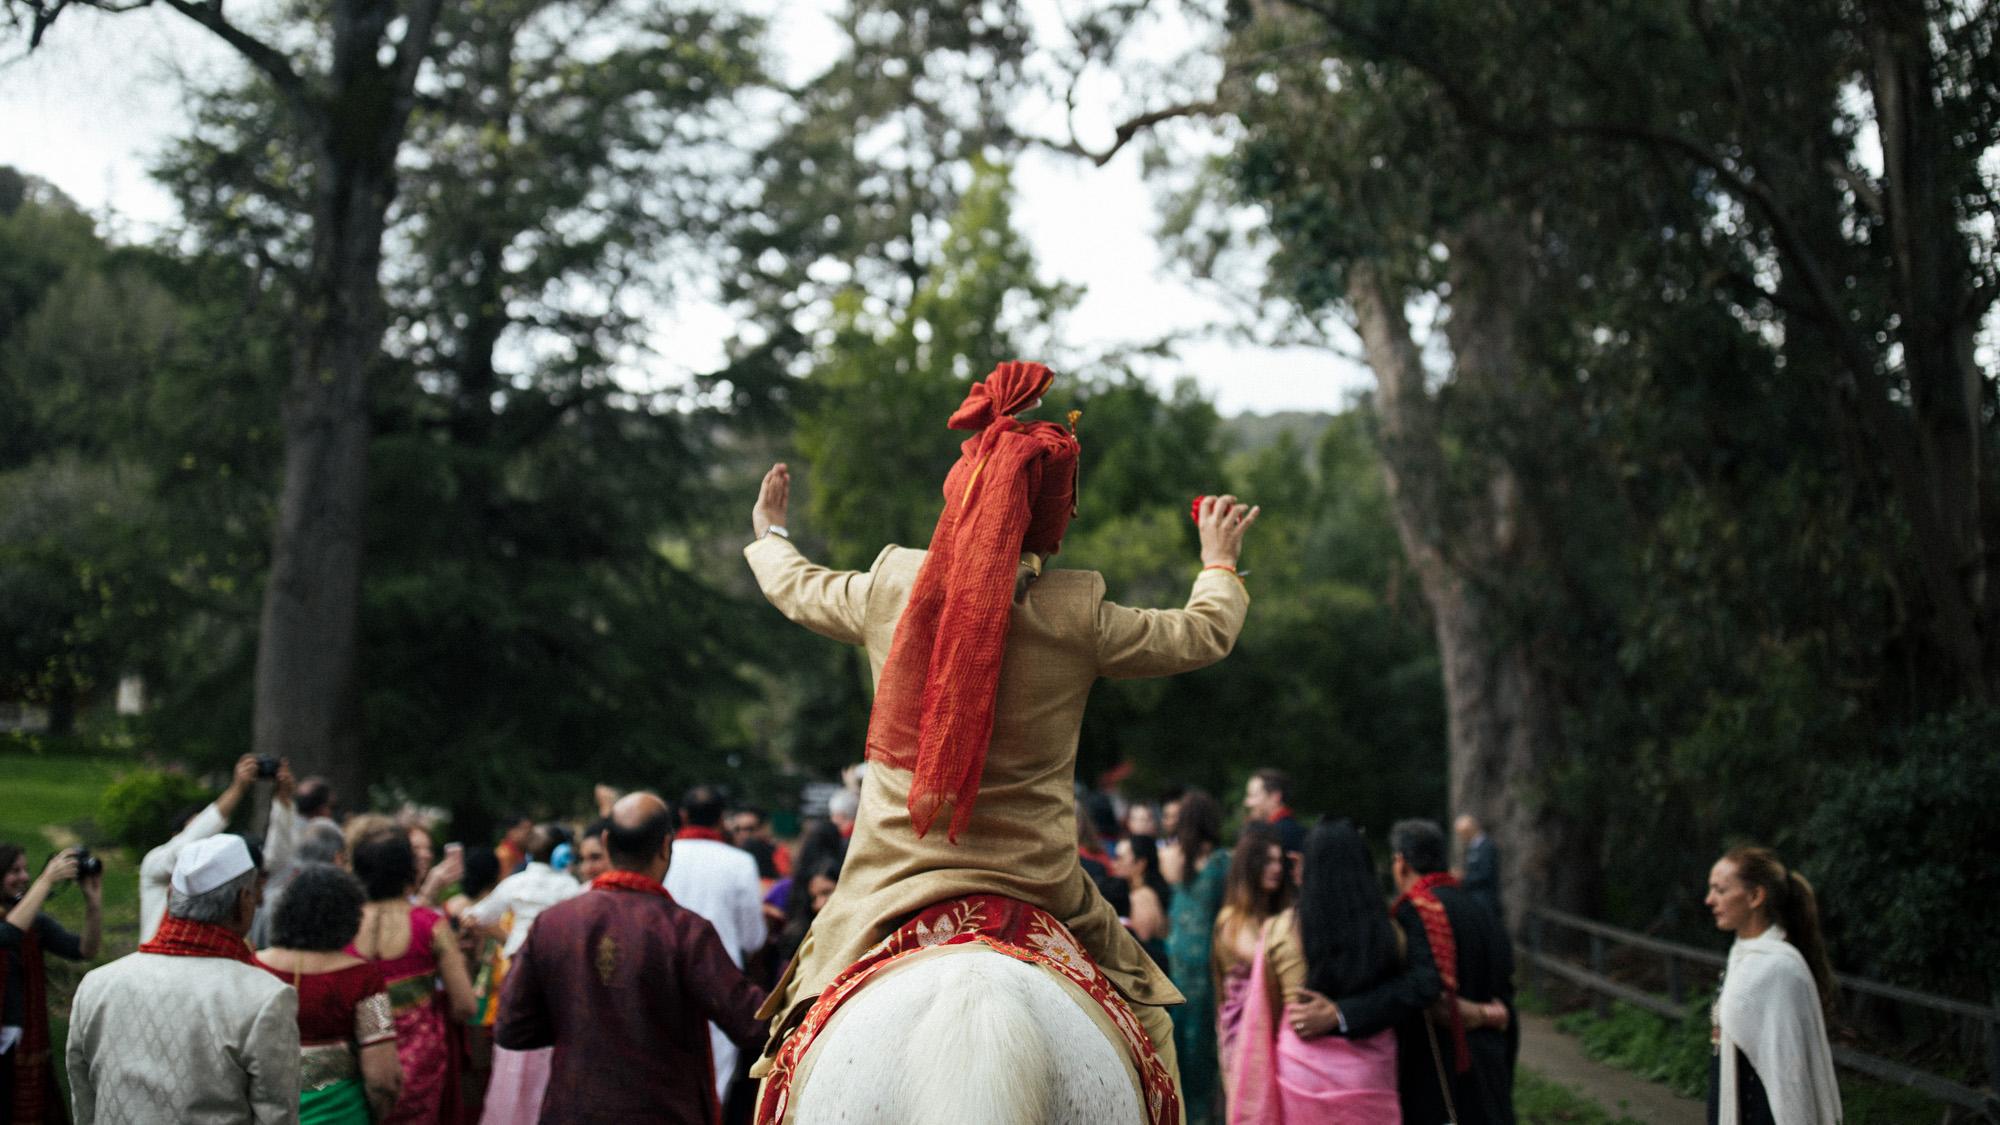 anu_maneesh_alec_vanderboom_Indian_wedding_photography-0075.jpg